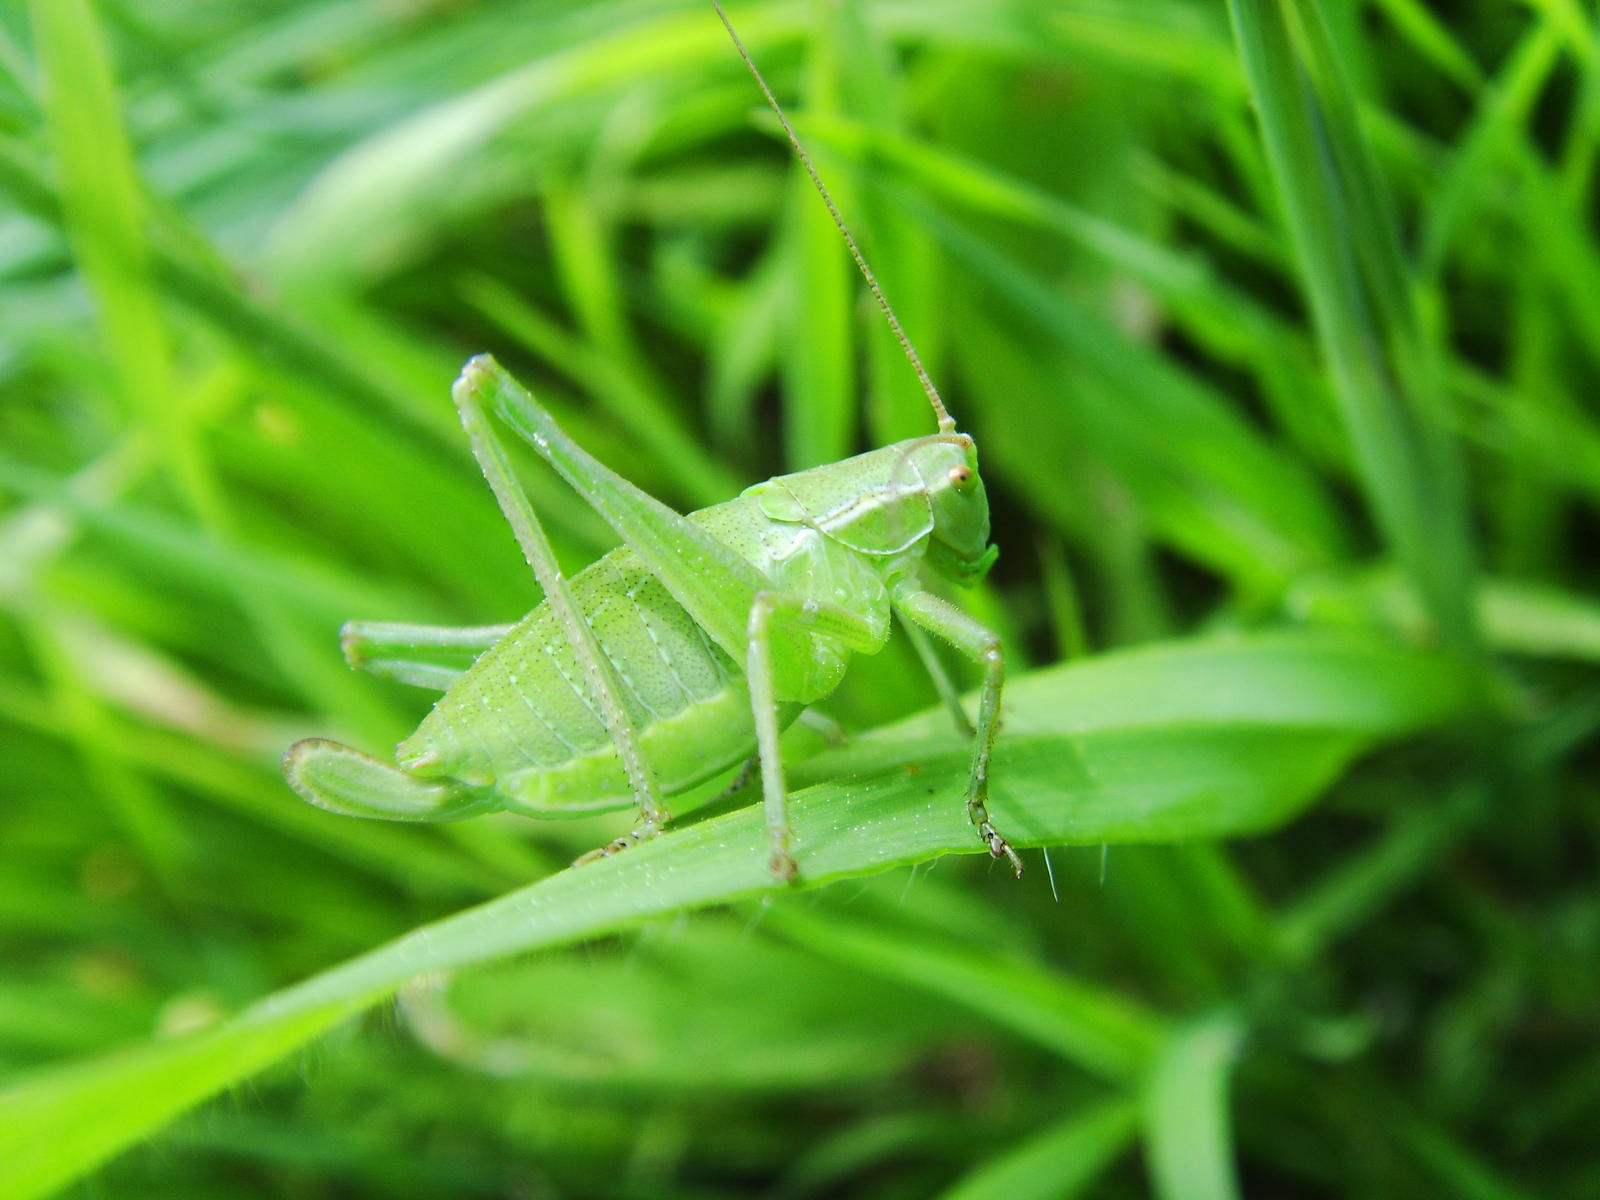 Green Grasshopper by Victoria-Nehaichik on DeviantArt